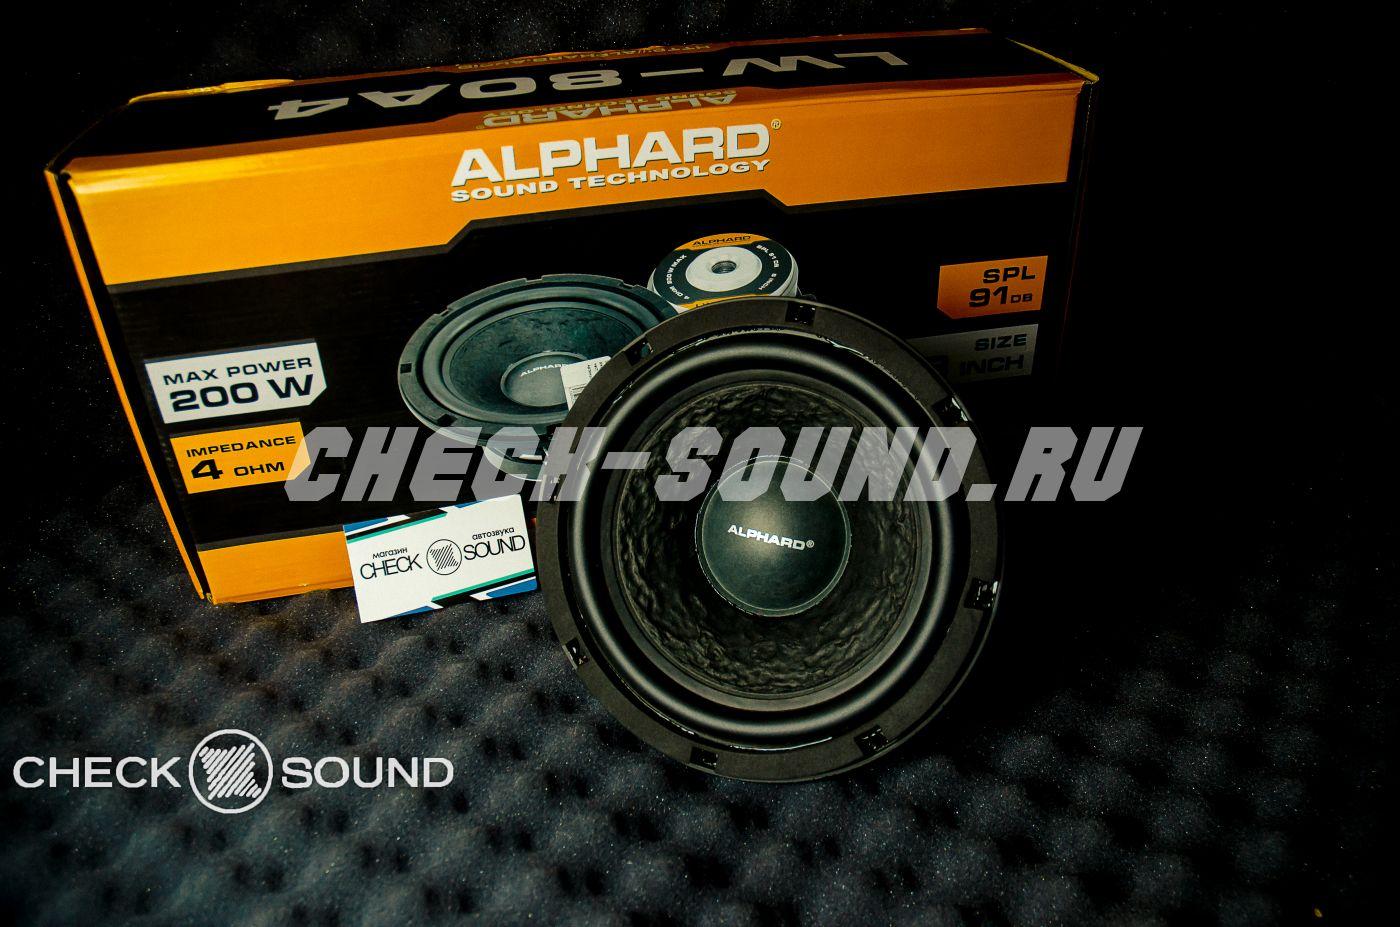 ALPHARD LW-80A4